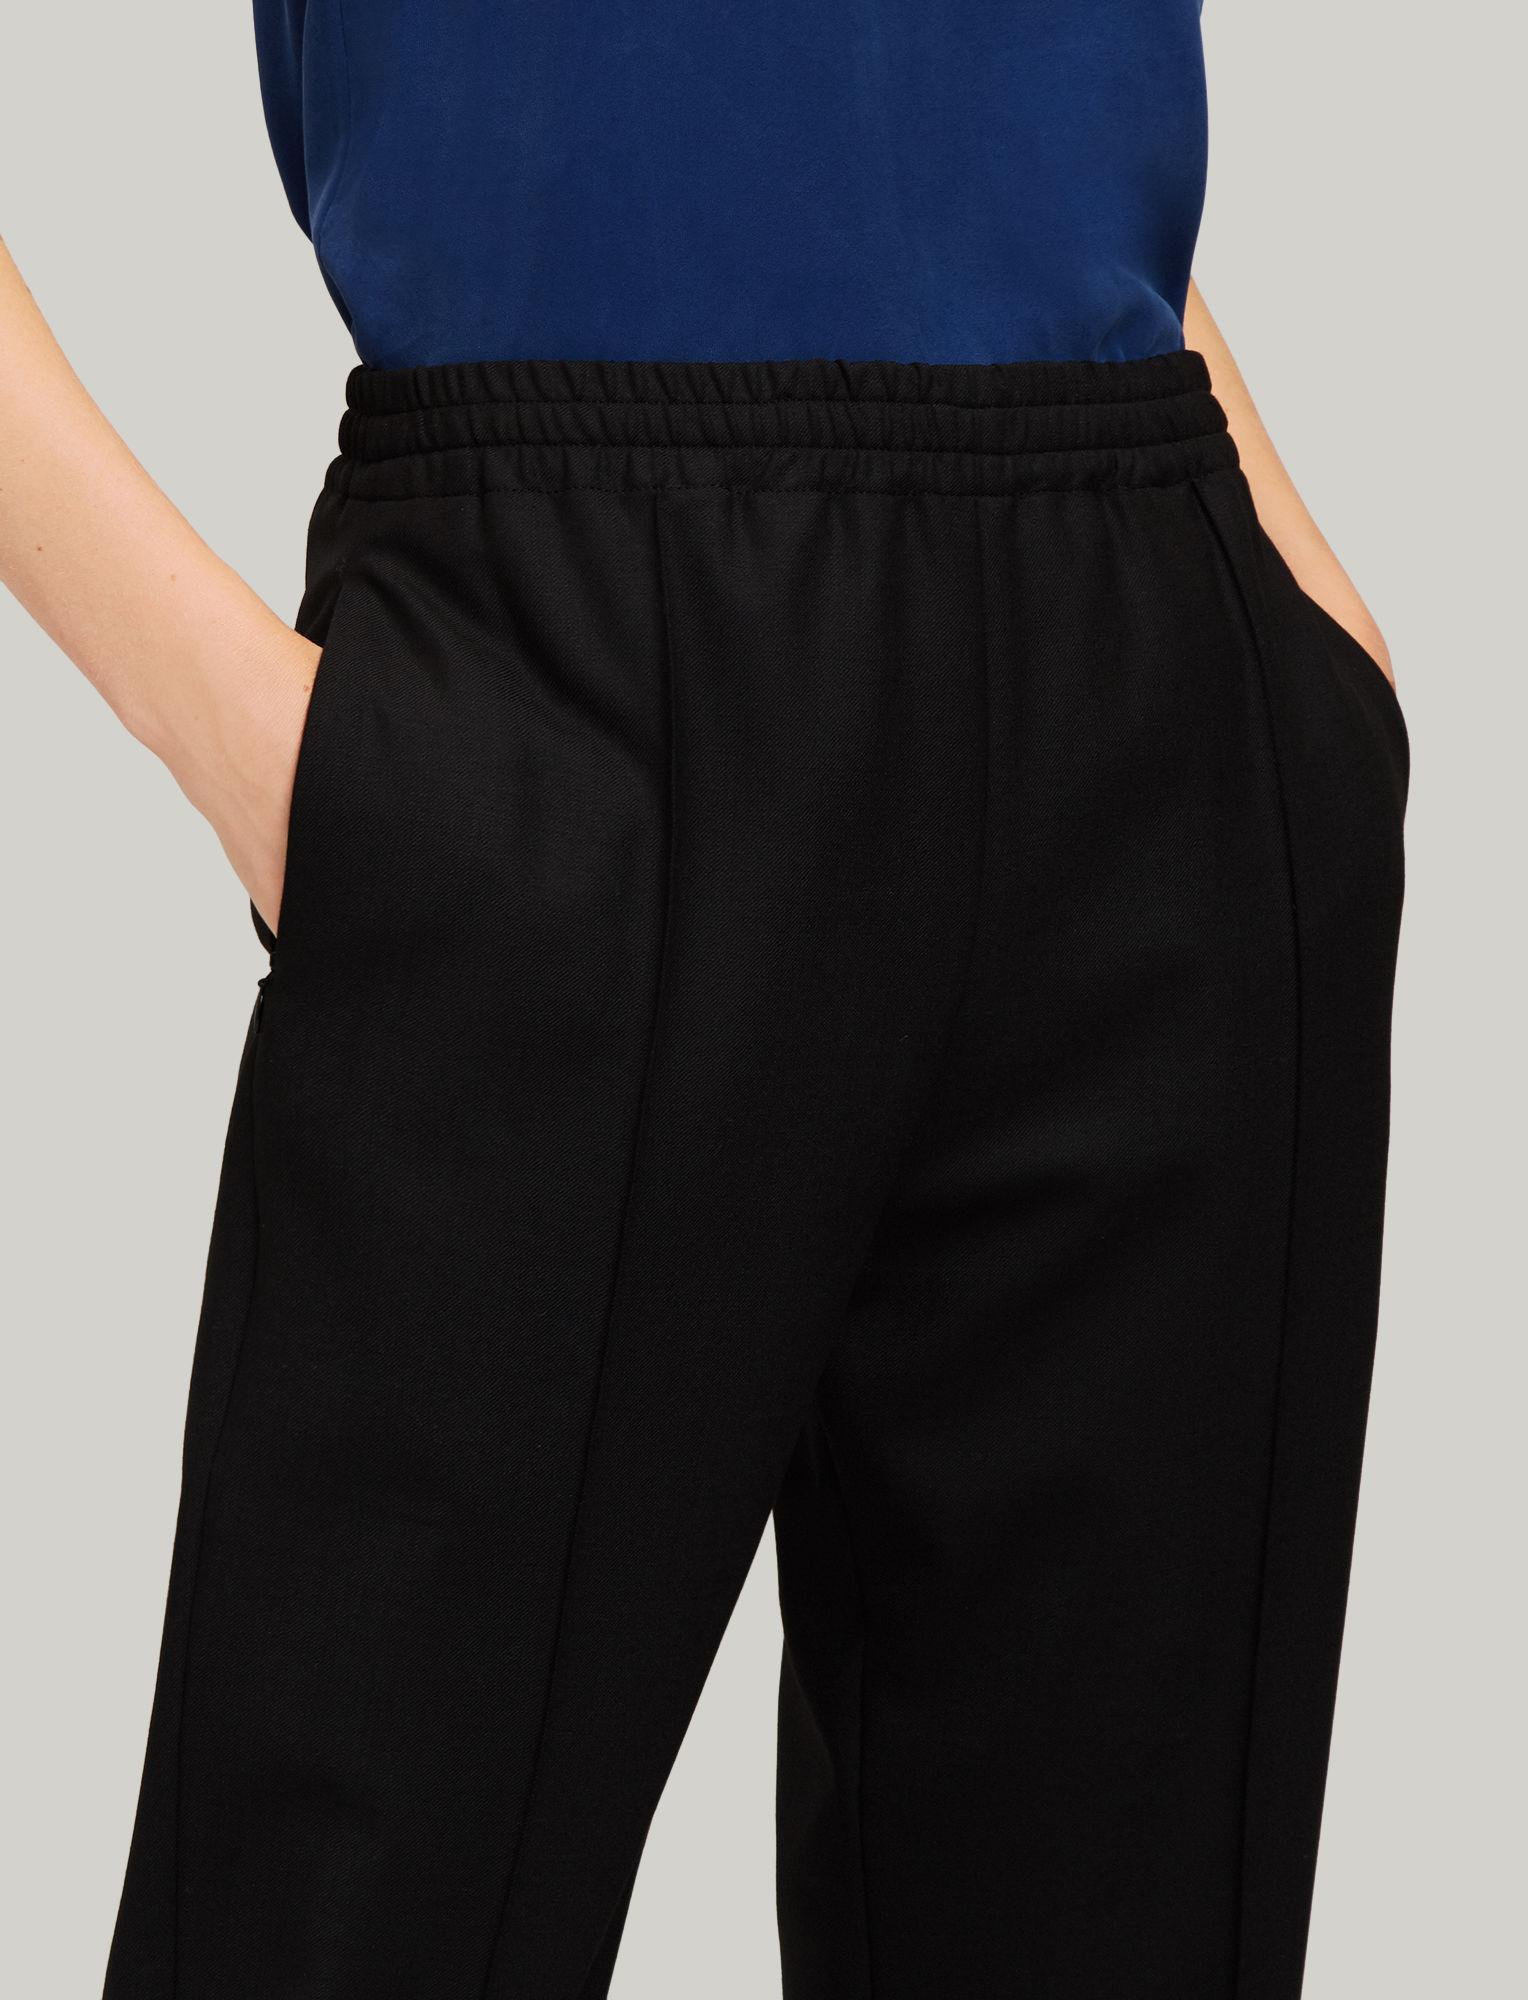 0ca1b8a8dfe Joseph - Black Dalton Comfort Wool Trousers - Lyst. View fullscreen